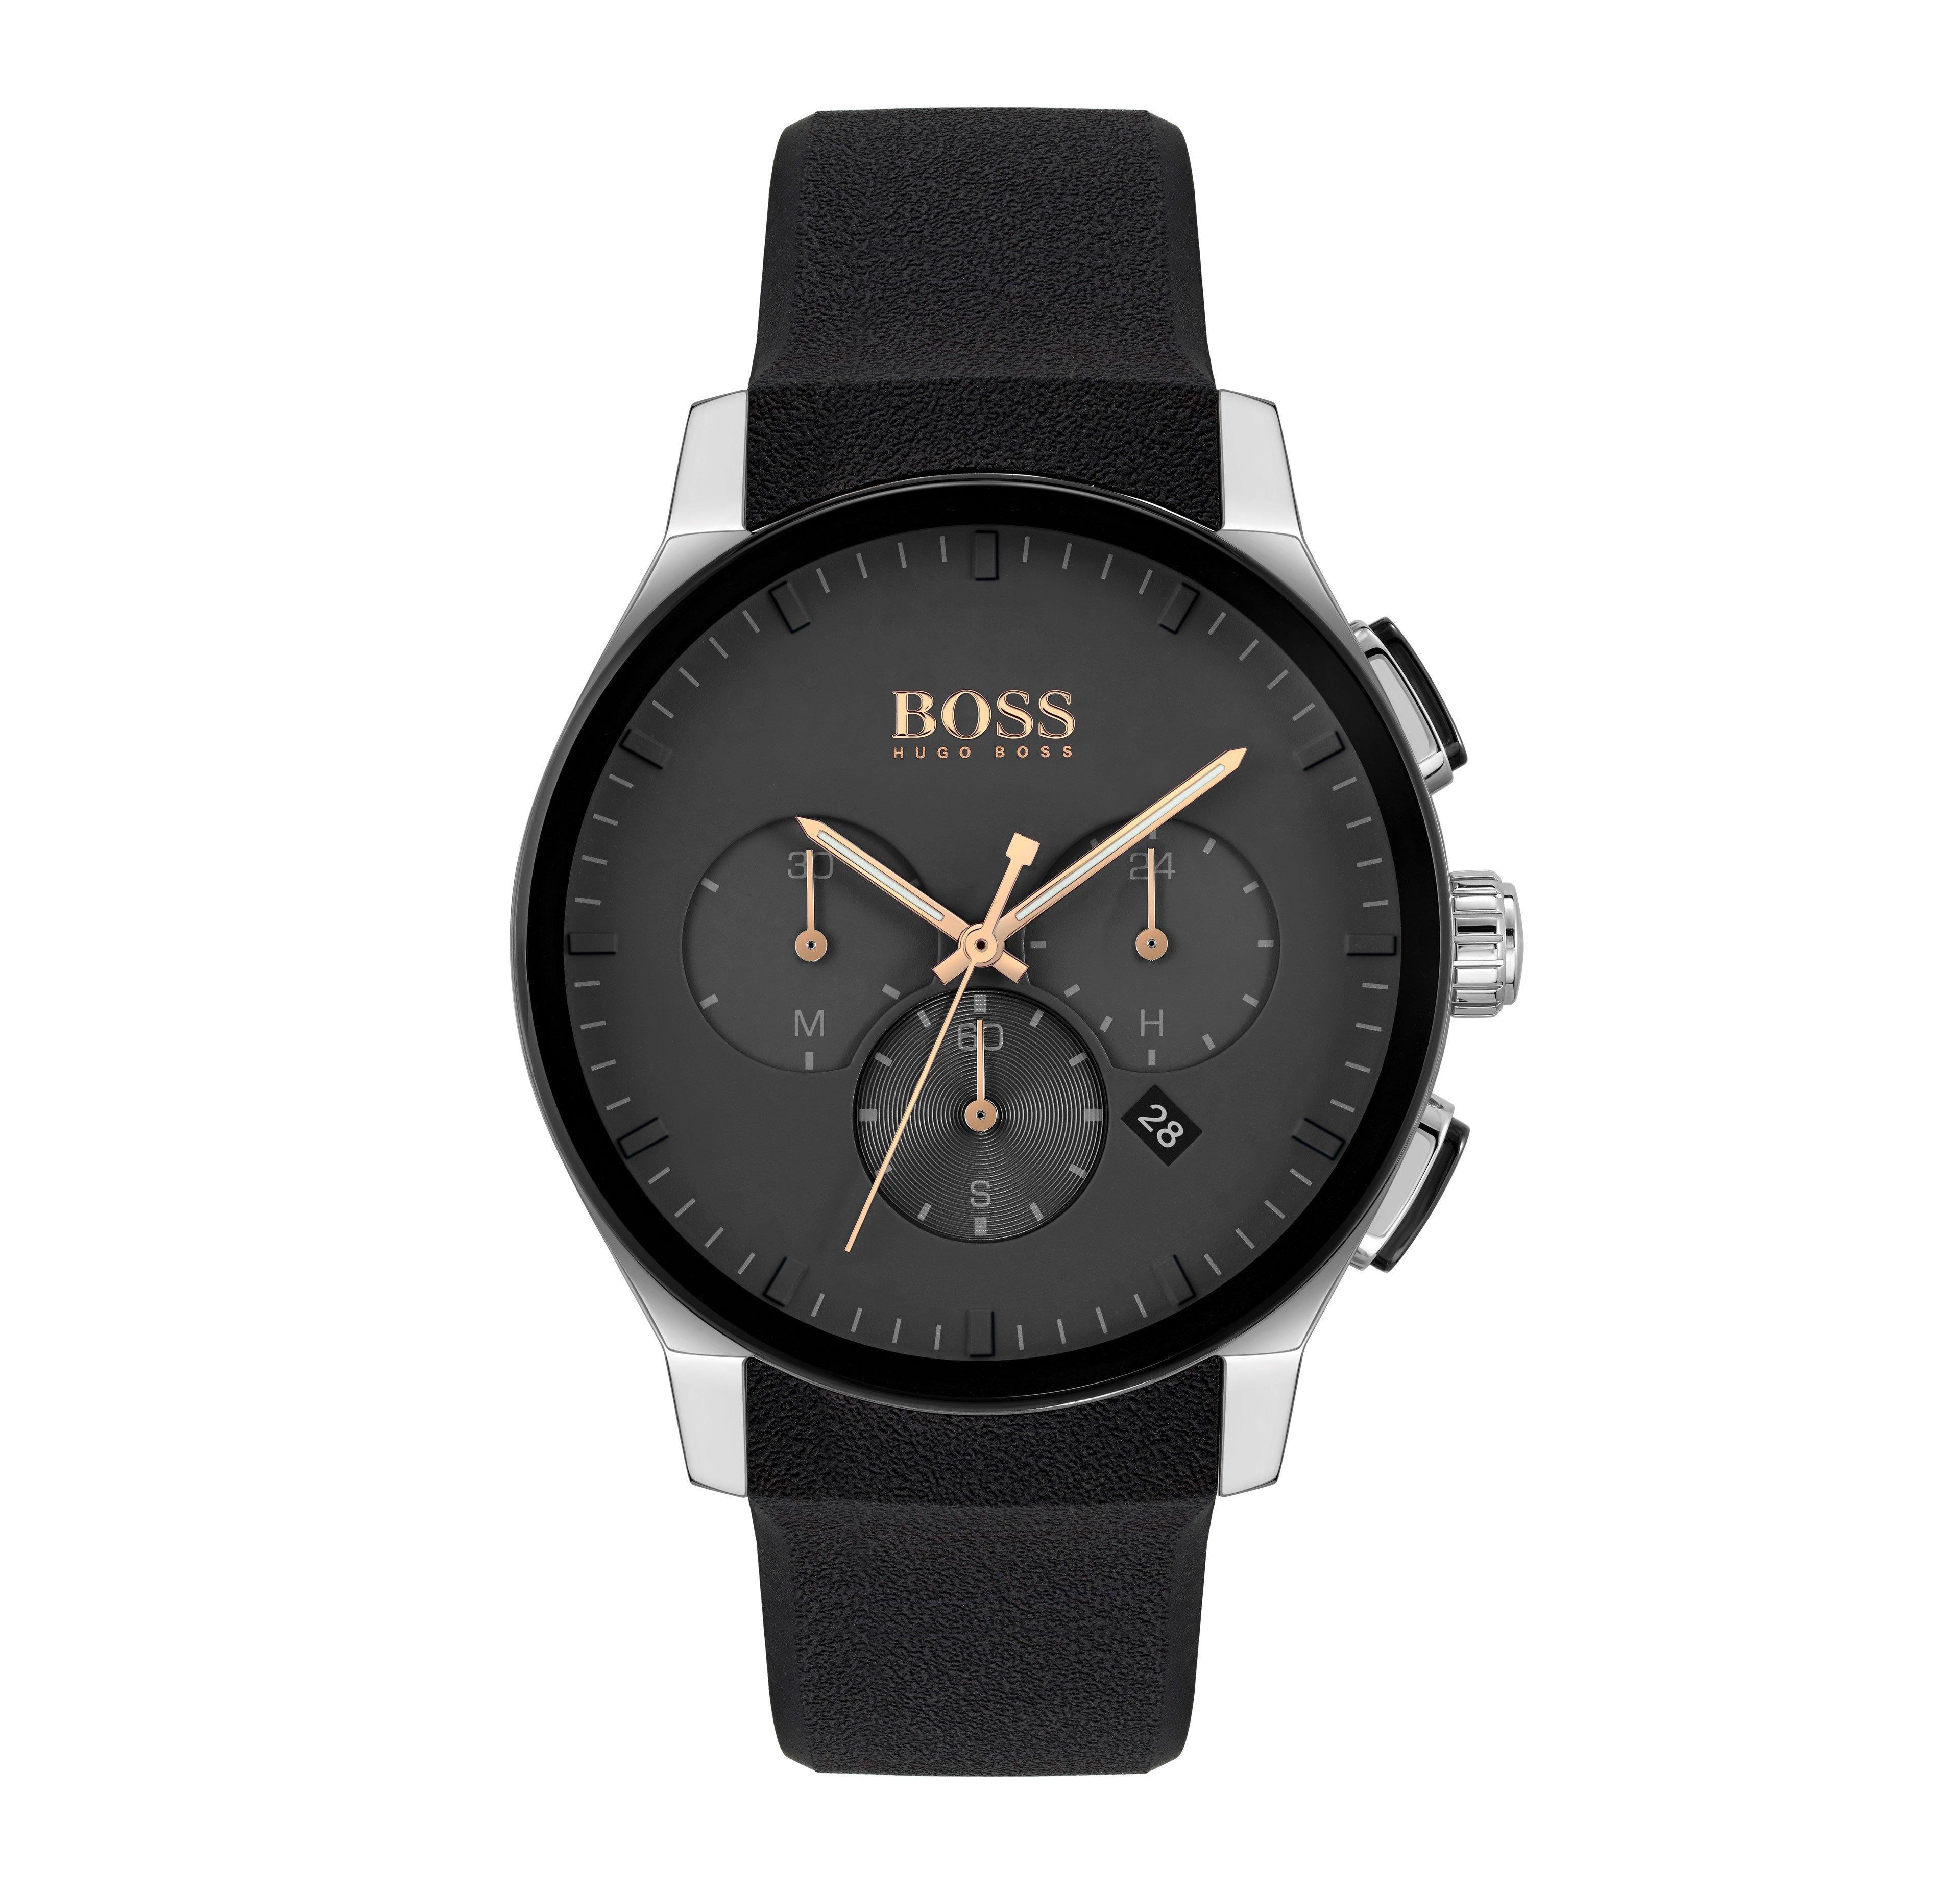 BOSS Peak Chronograph Men's Watch